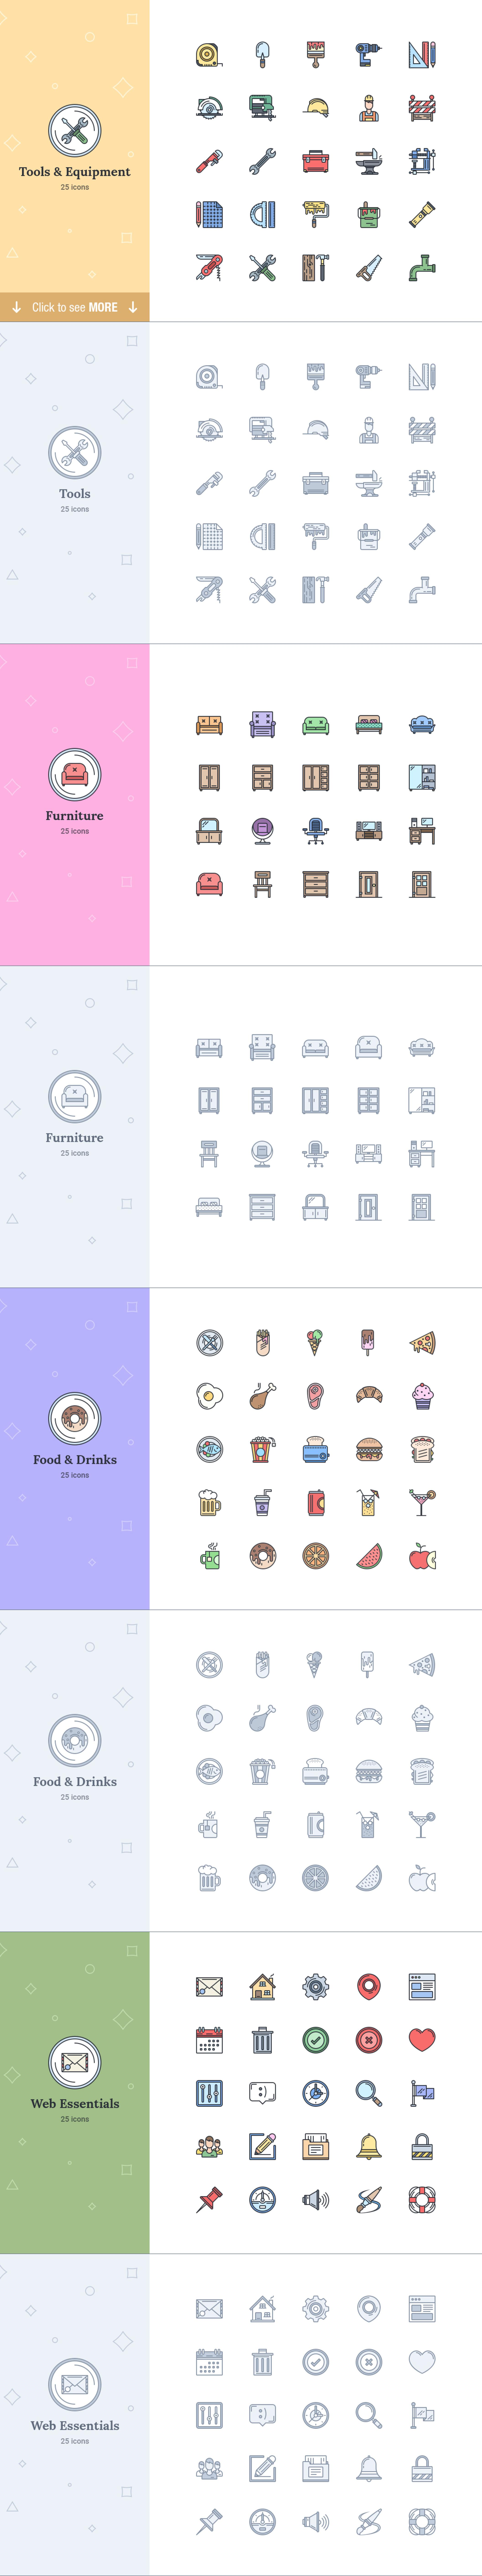 620+ Flat landing page icons